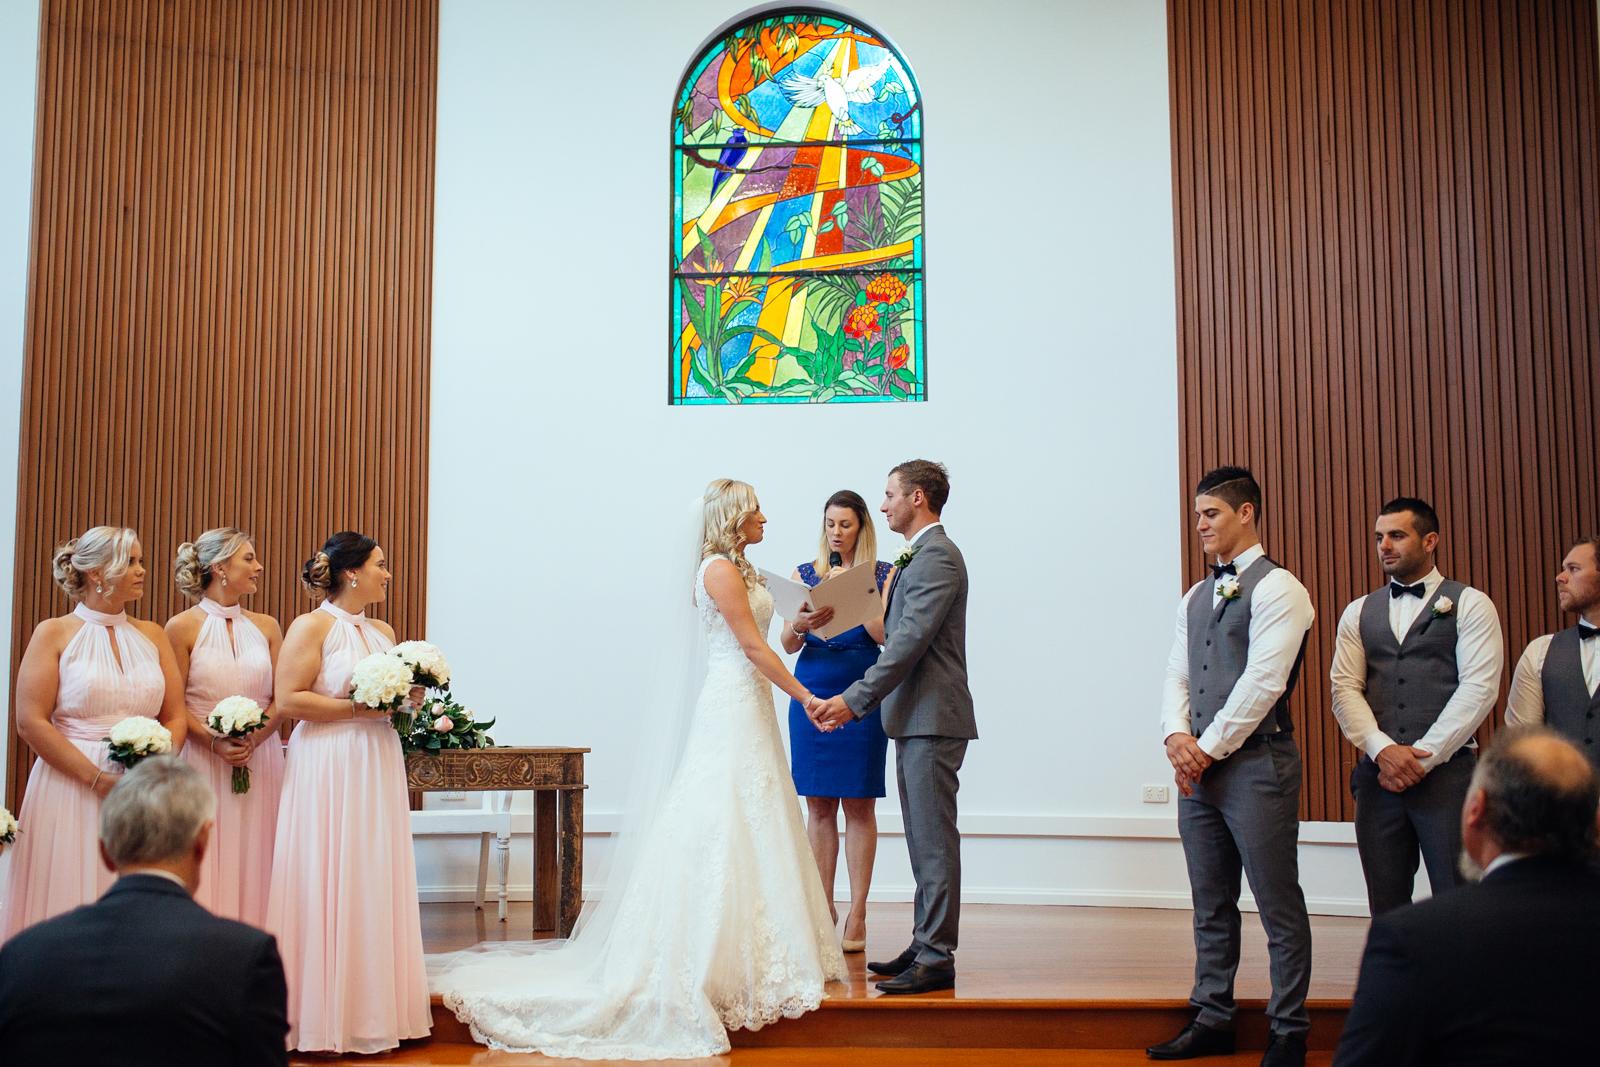 Royal Pines Wedding Chapel